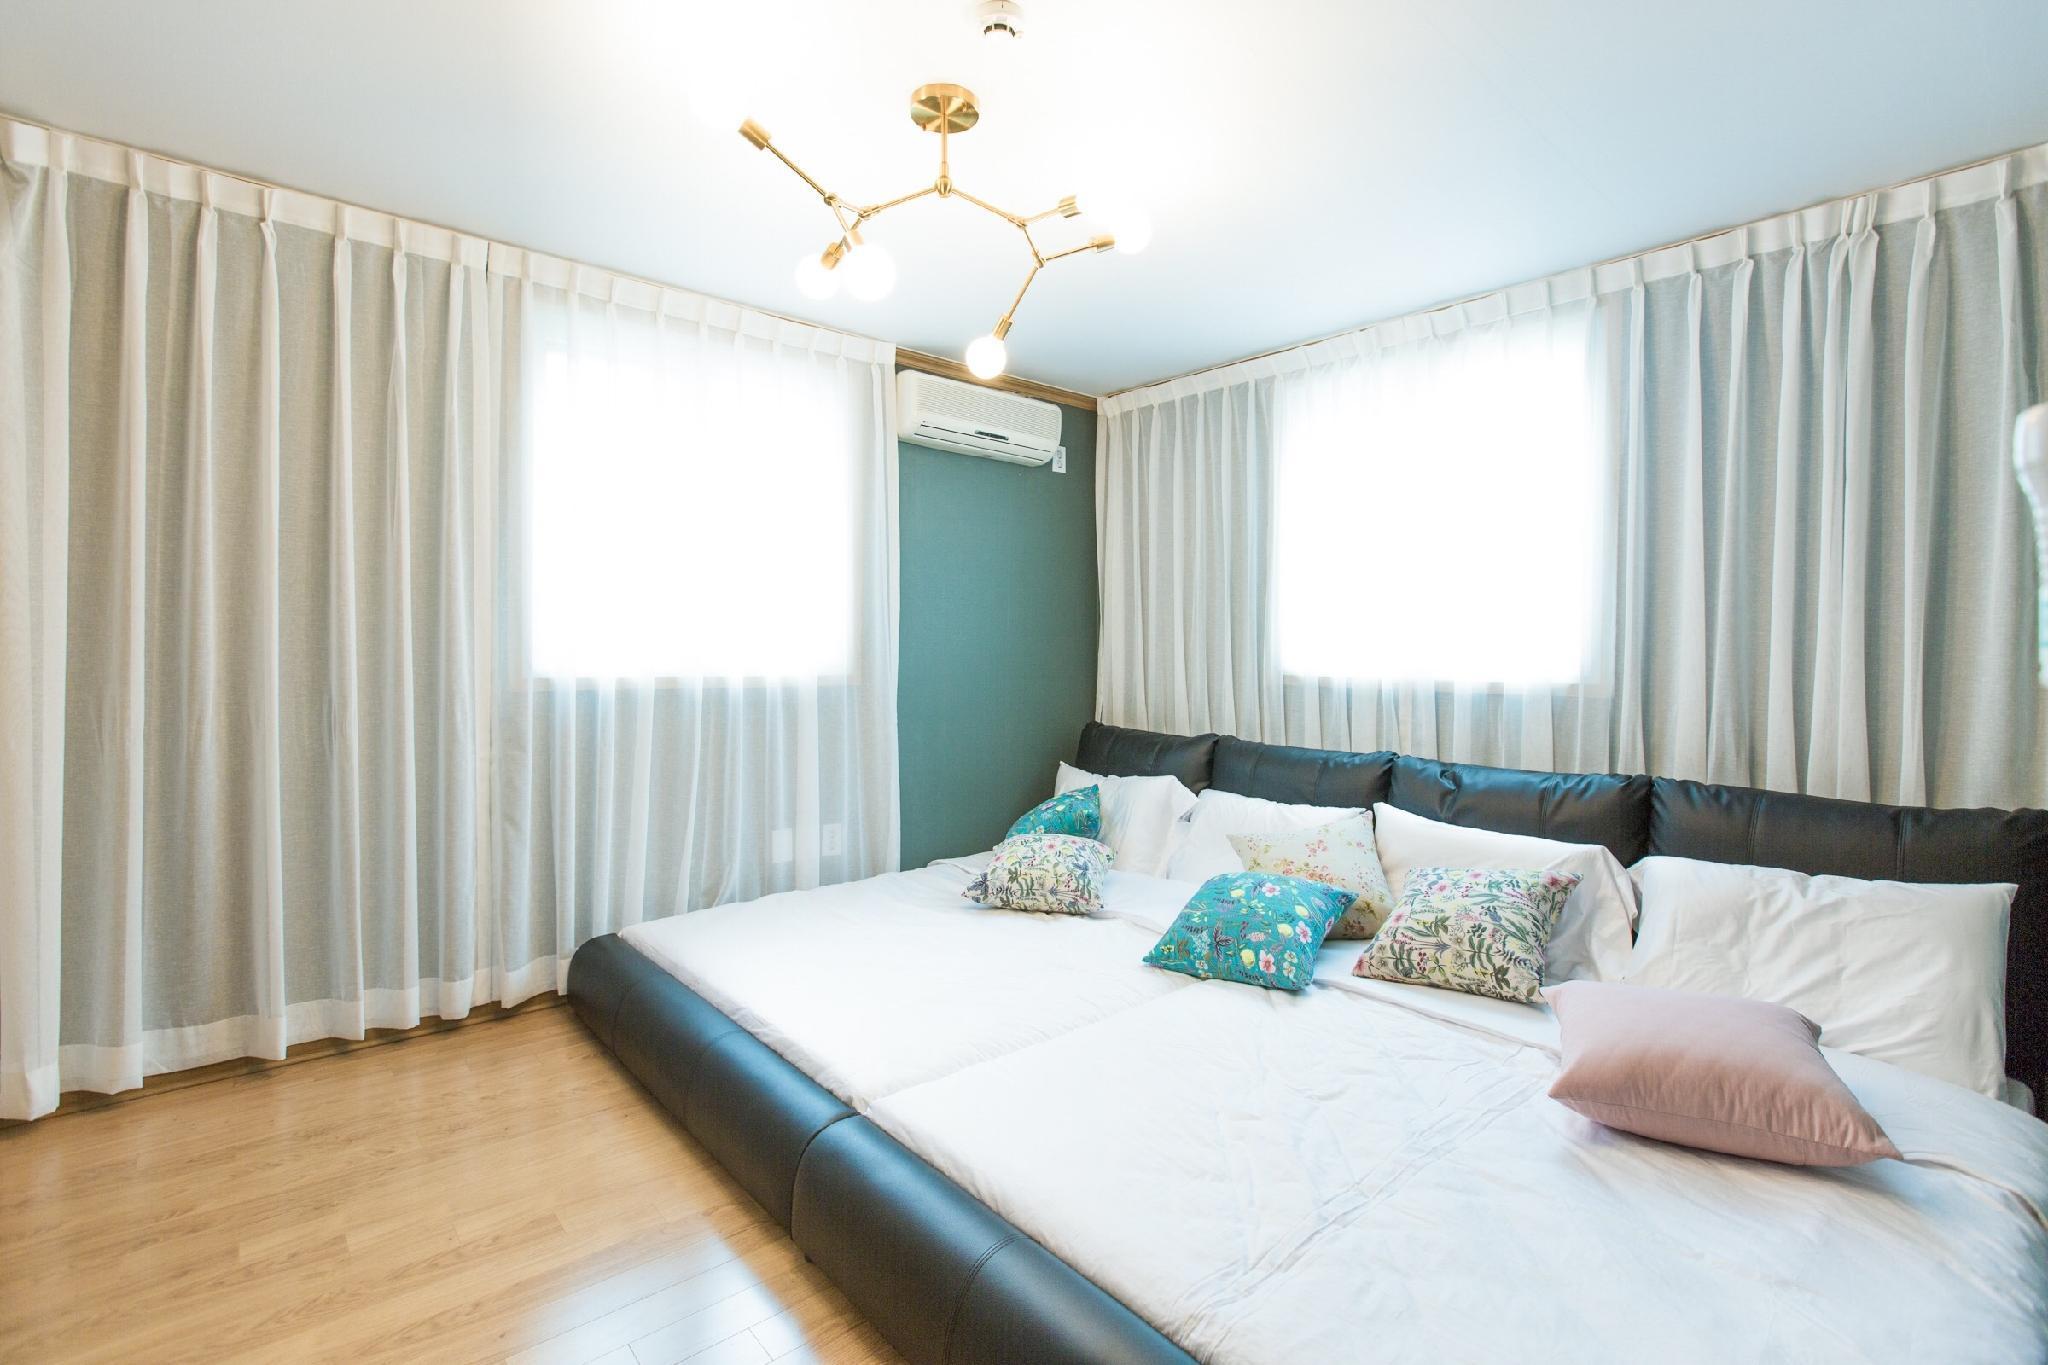 Hongik Univ STN 2min 4BR&2BT Big&Cozy FamilyHouse